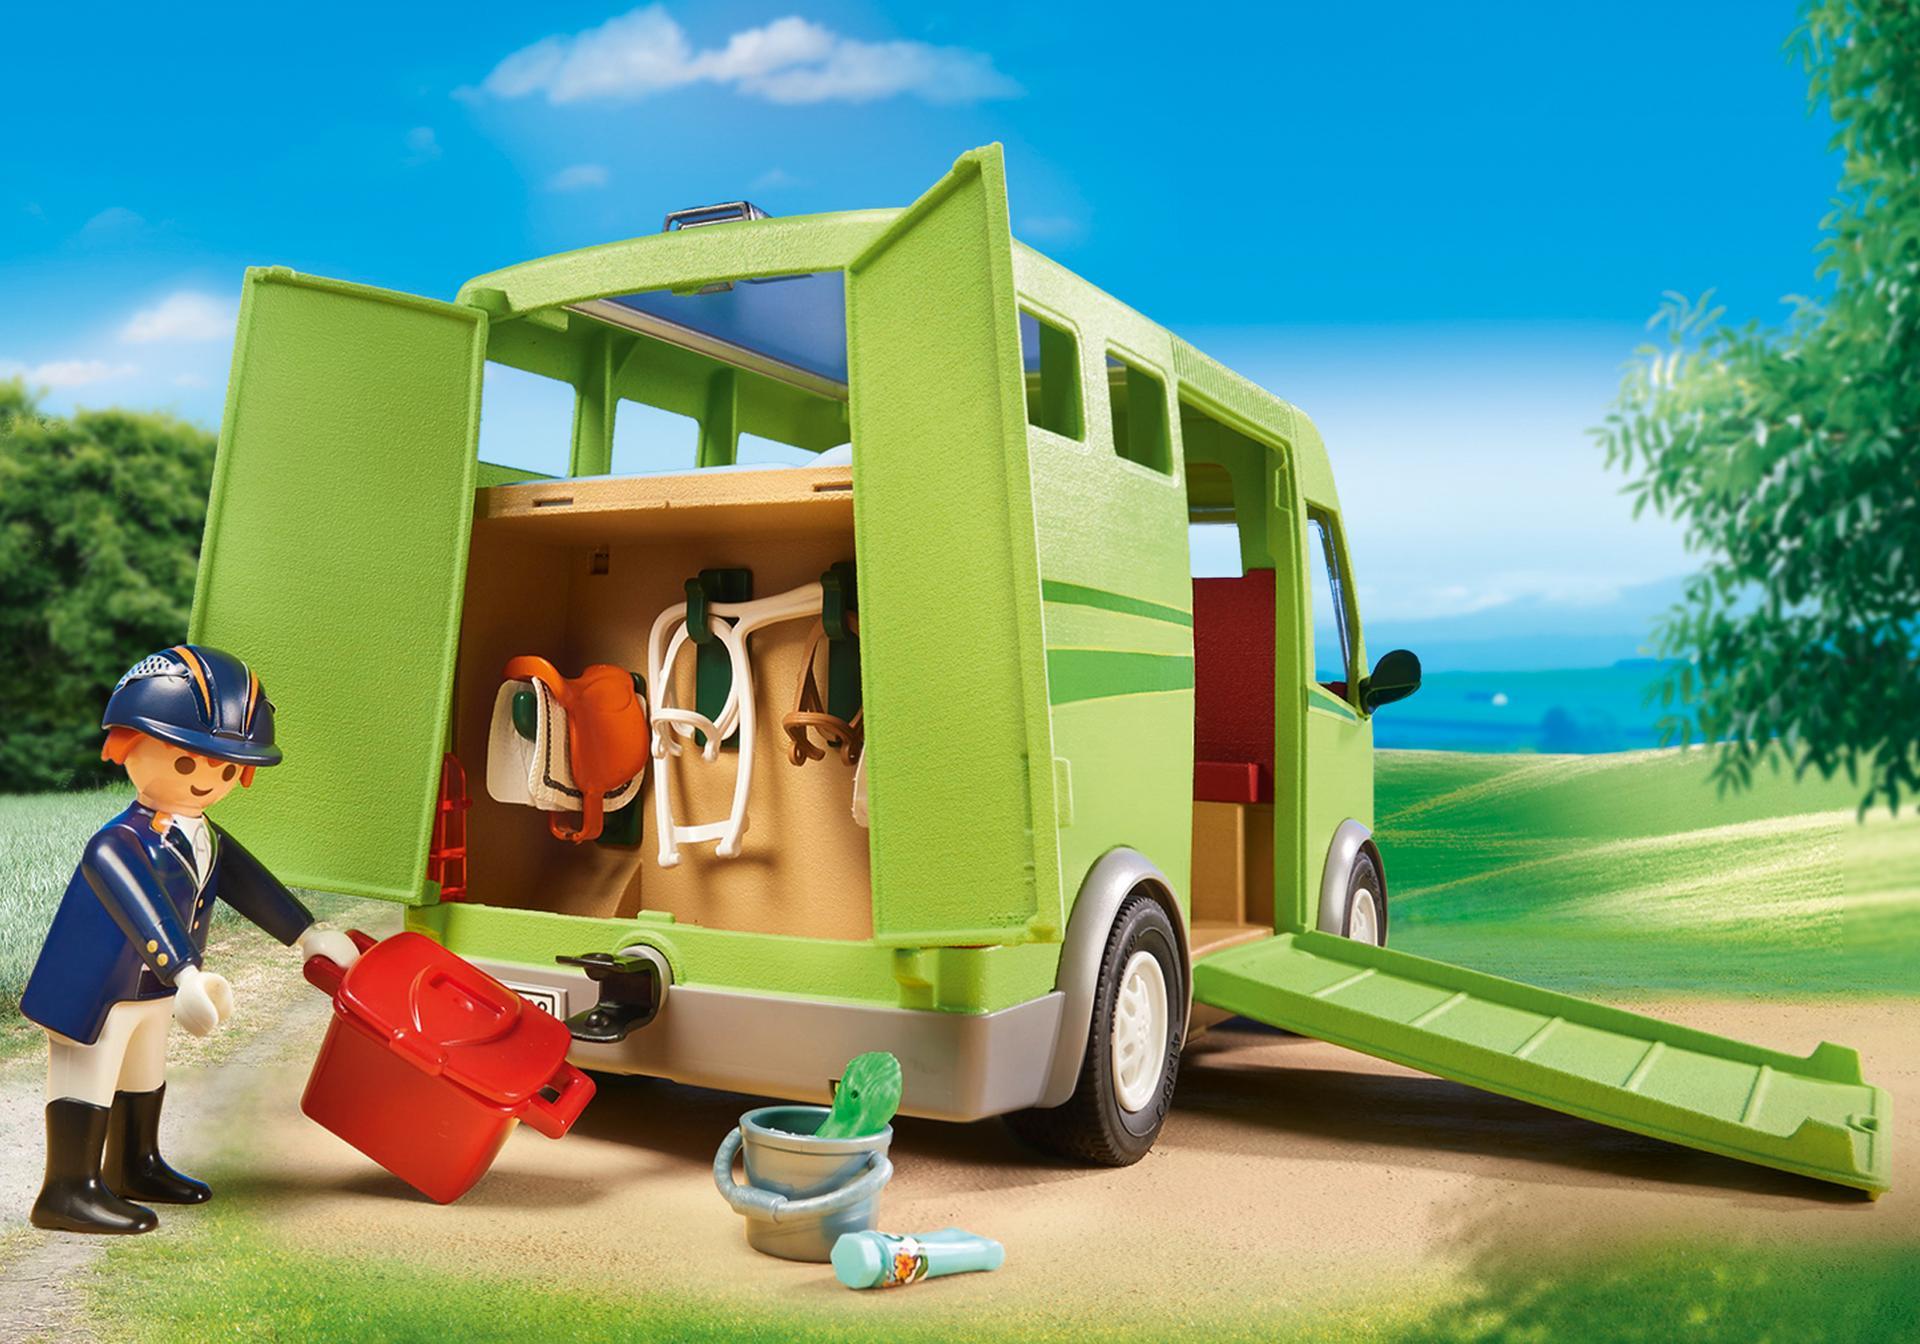 Paardenvrachtwagen 6928 Playmobil 174 Nederland